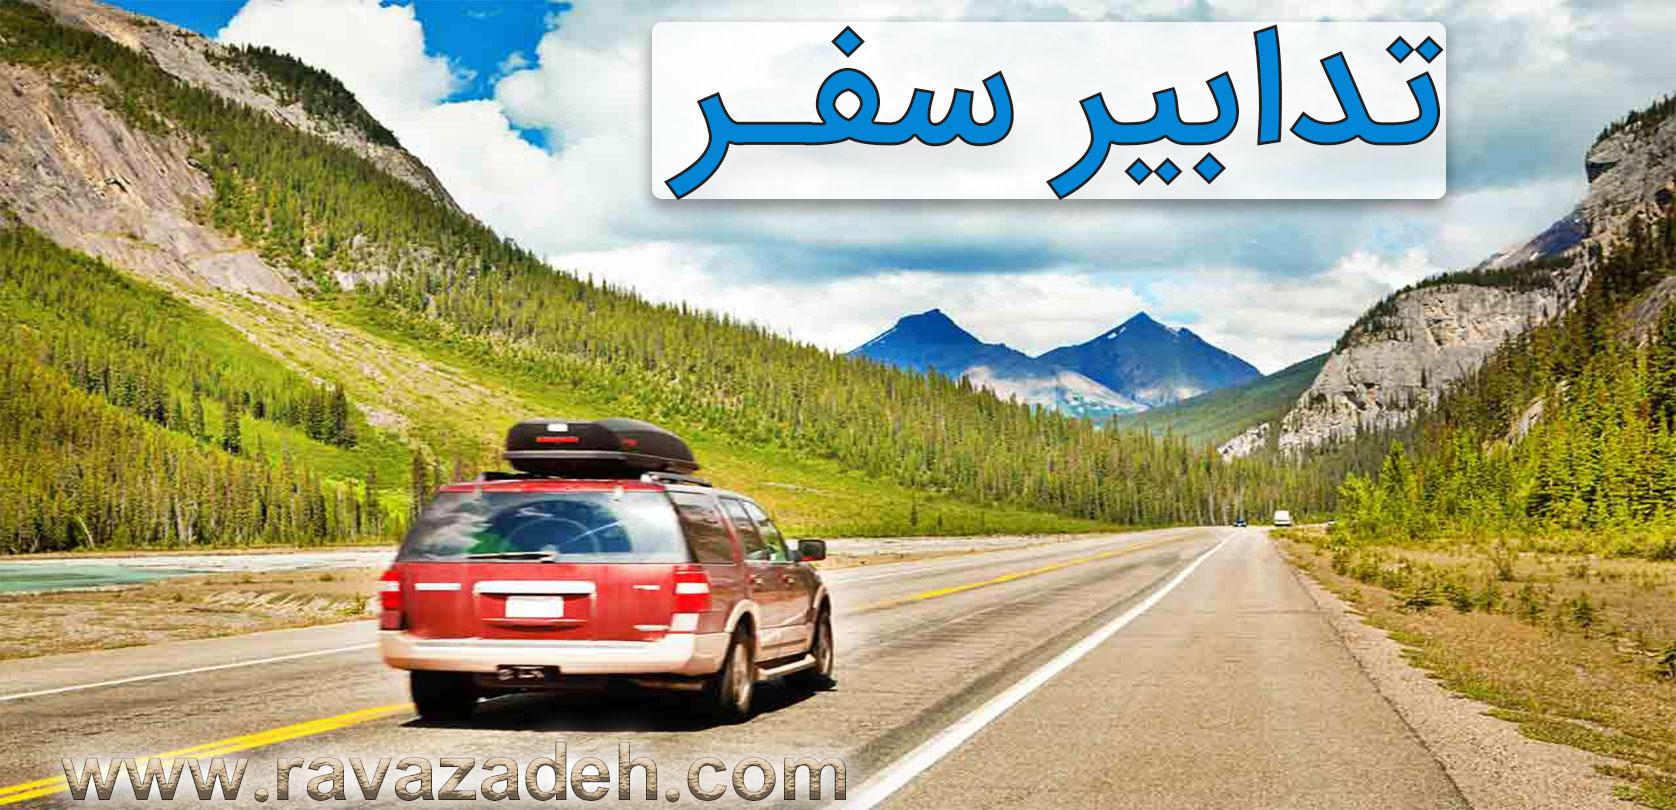 Photo of توصیه بهداشتی: تدابير سفـر